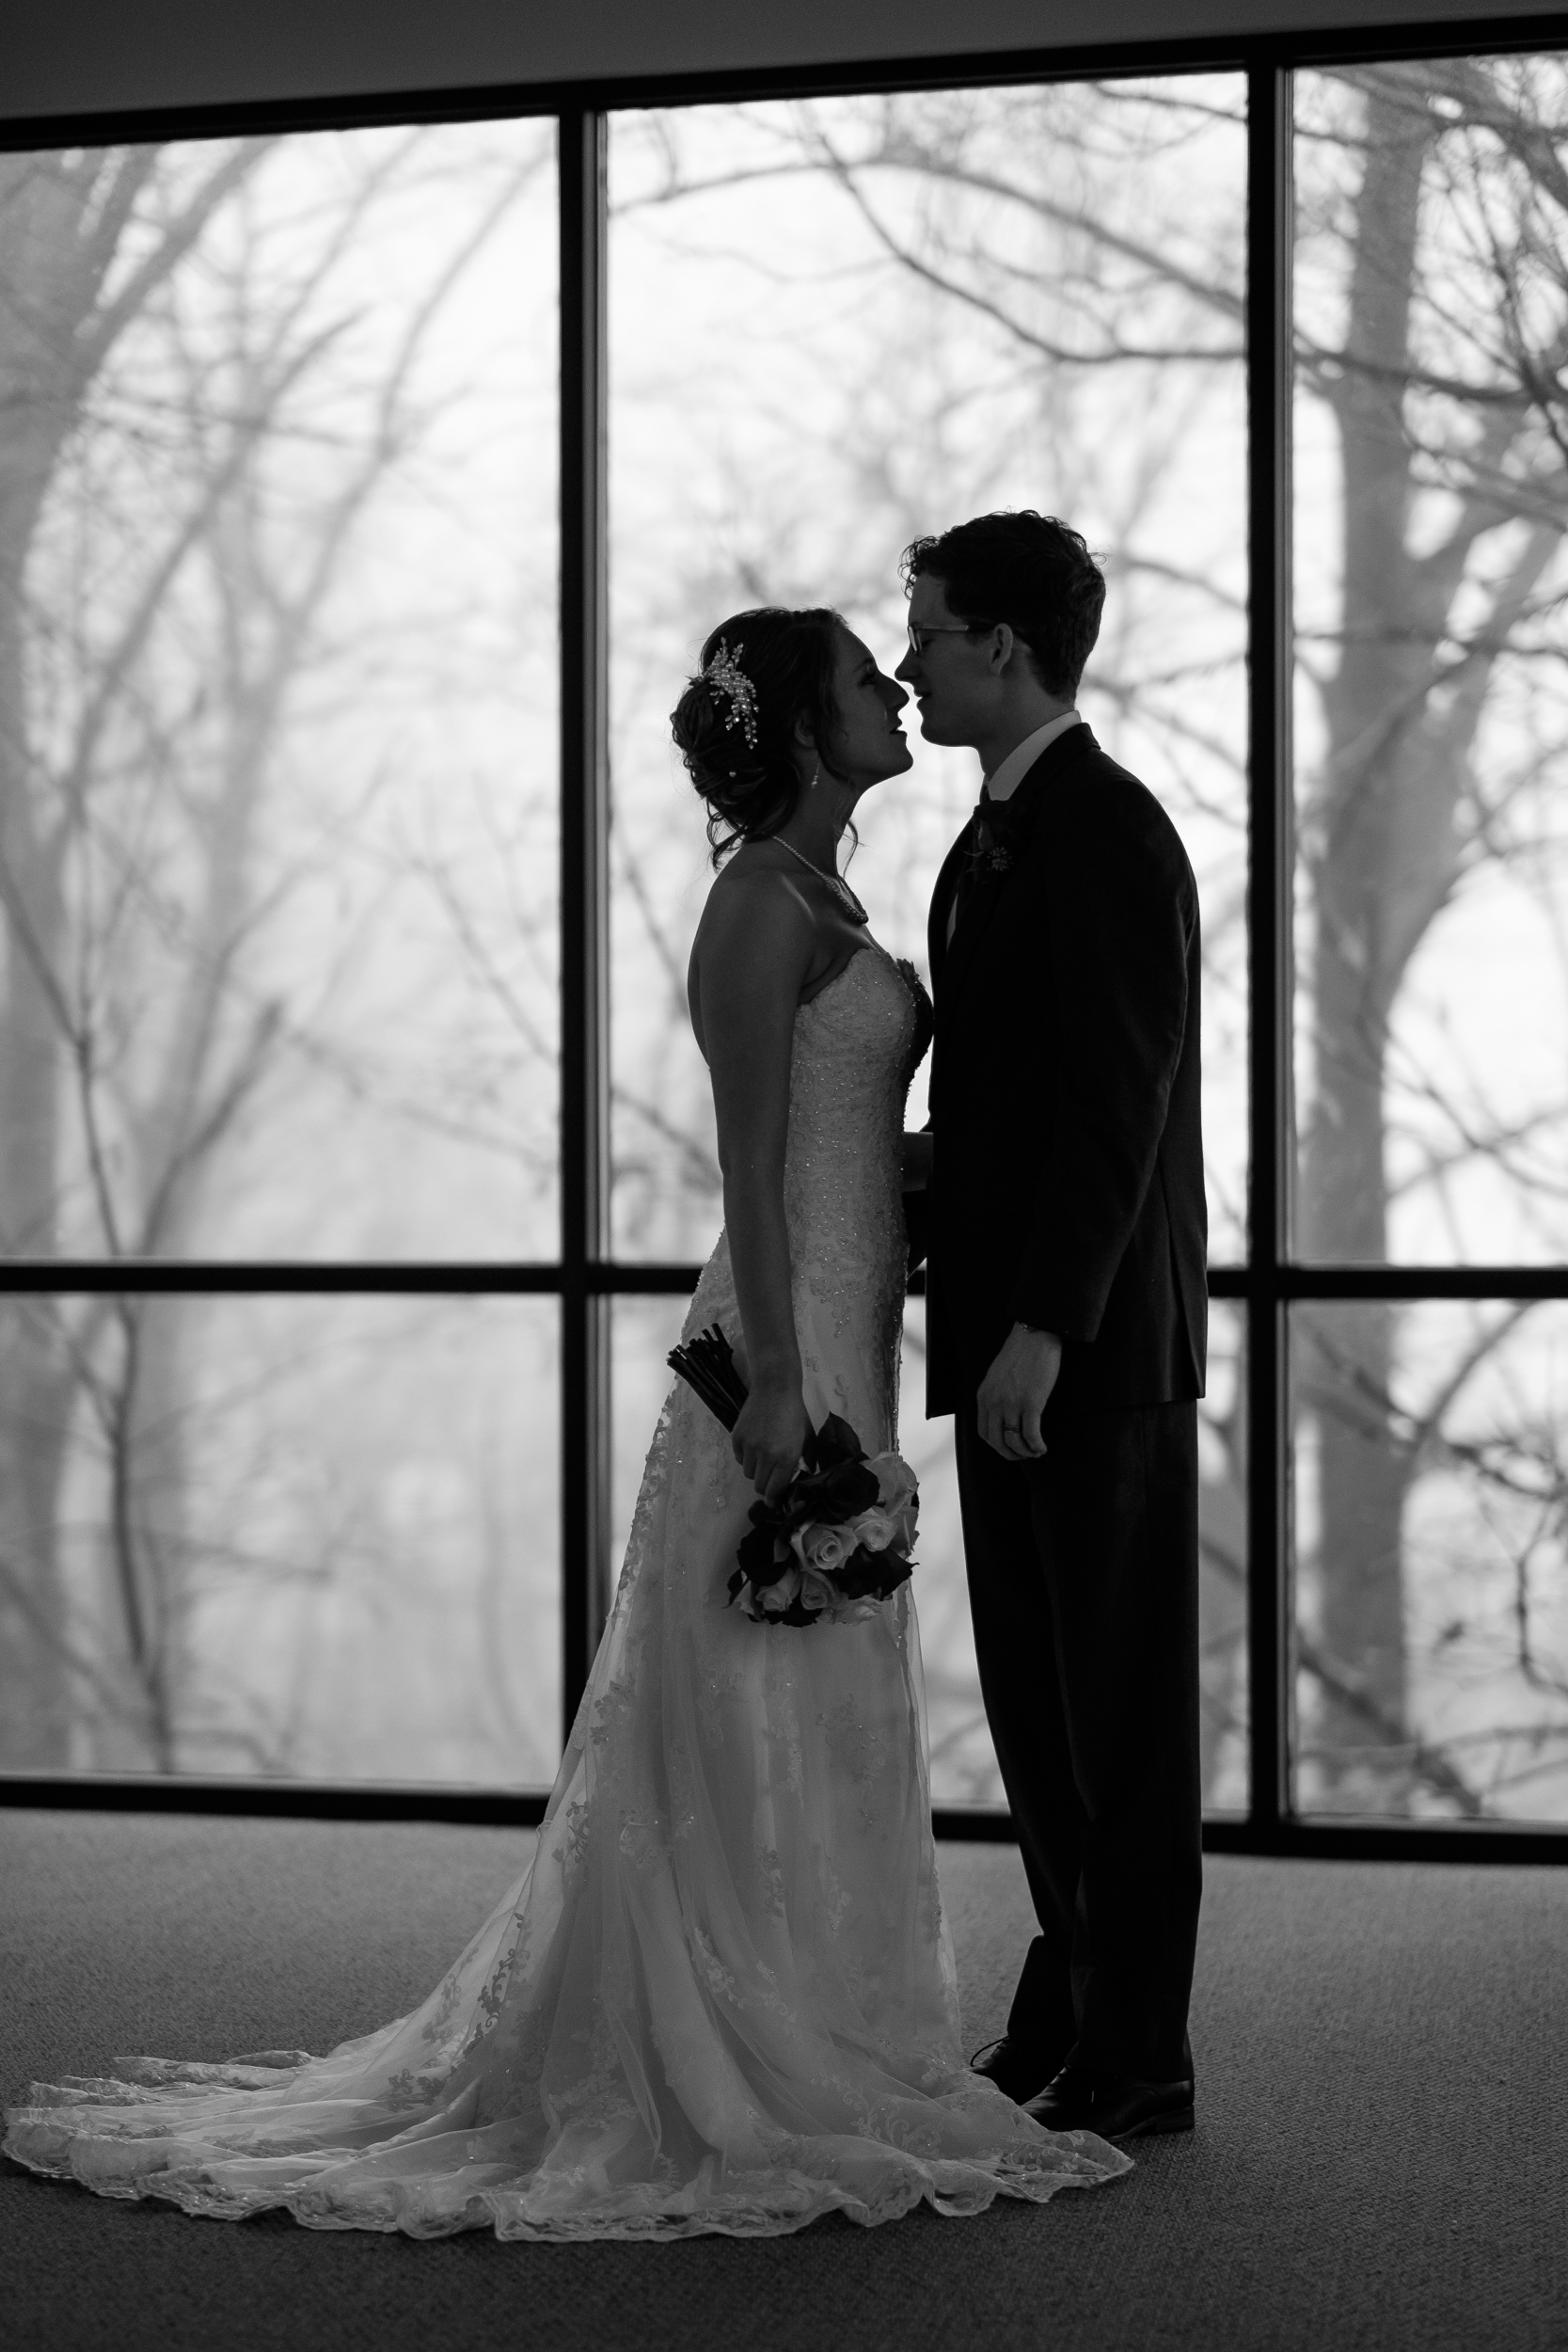 Joshua and Gracie-31.jpg